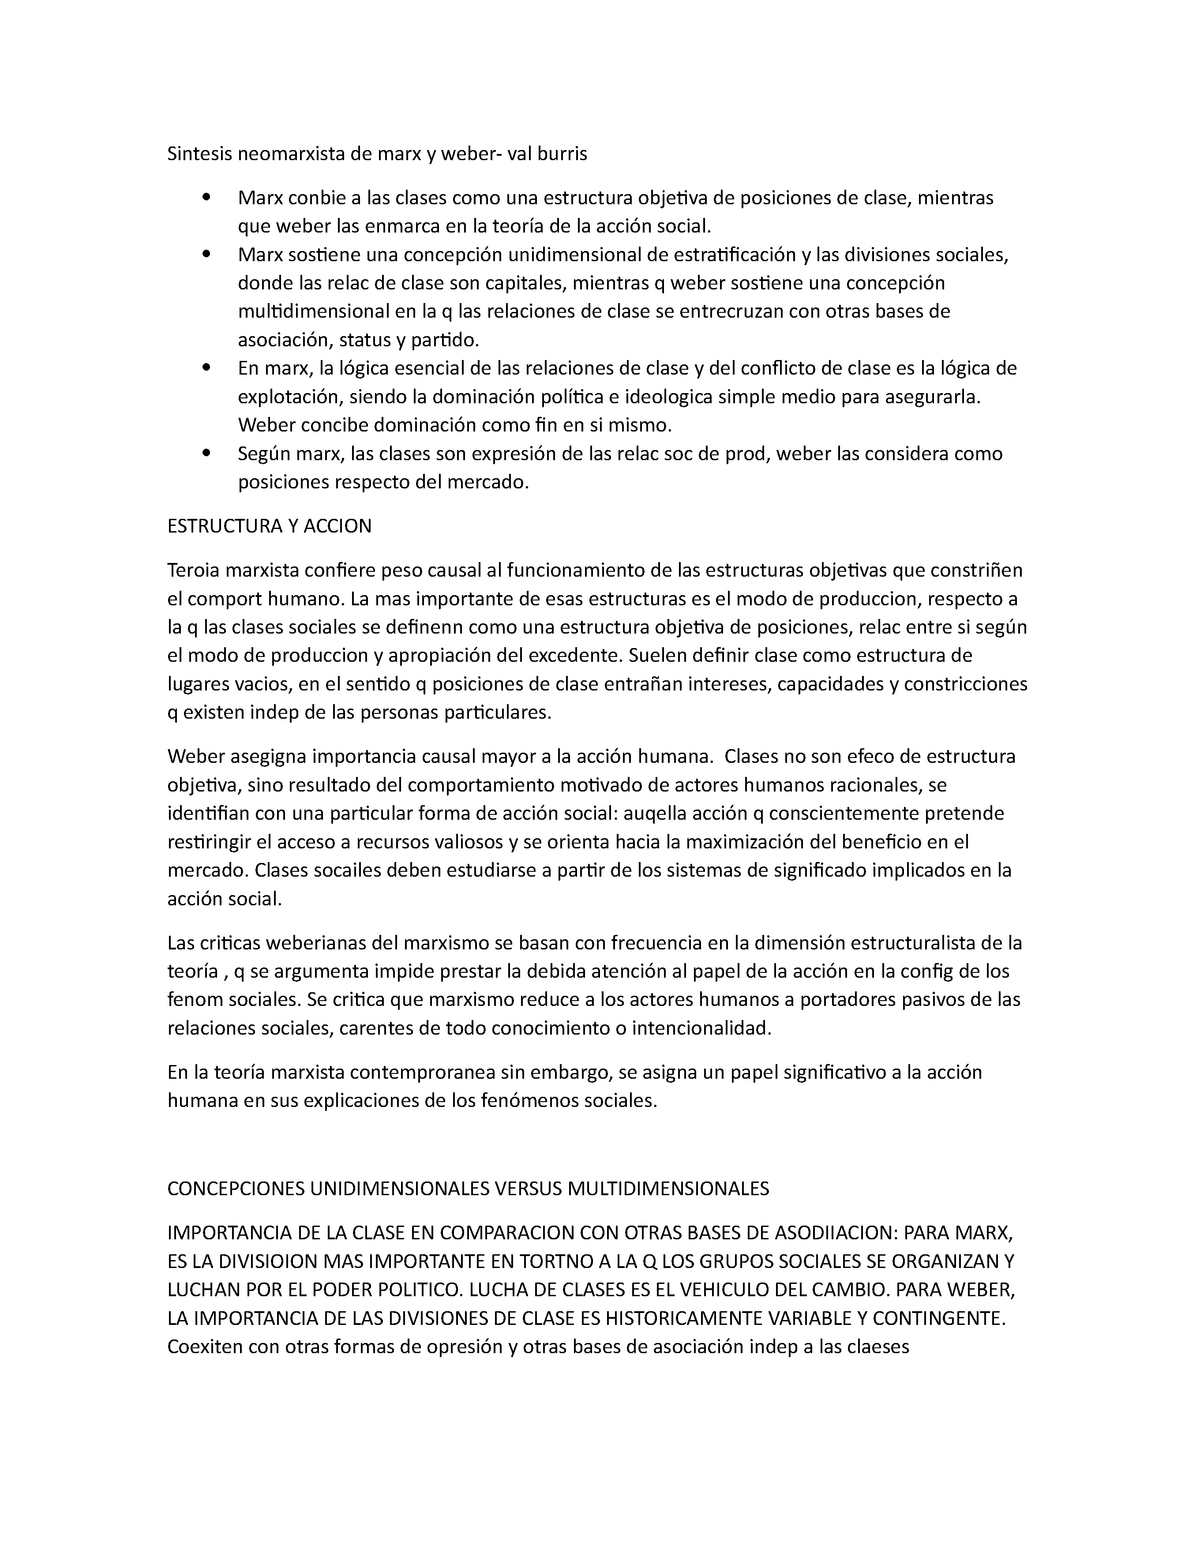 Sintesis Neomarxista De Marx Y Weber 4758 Uns Studocu